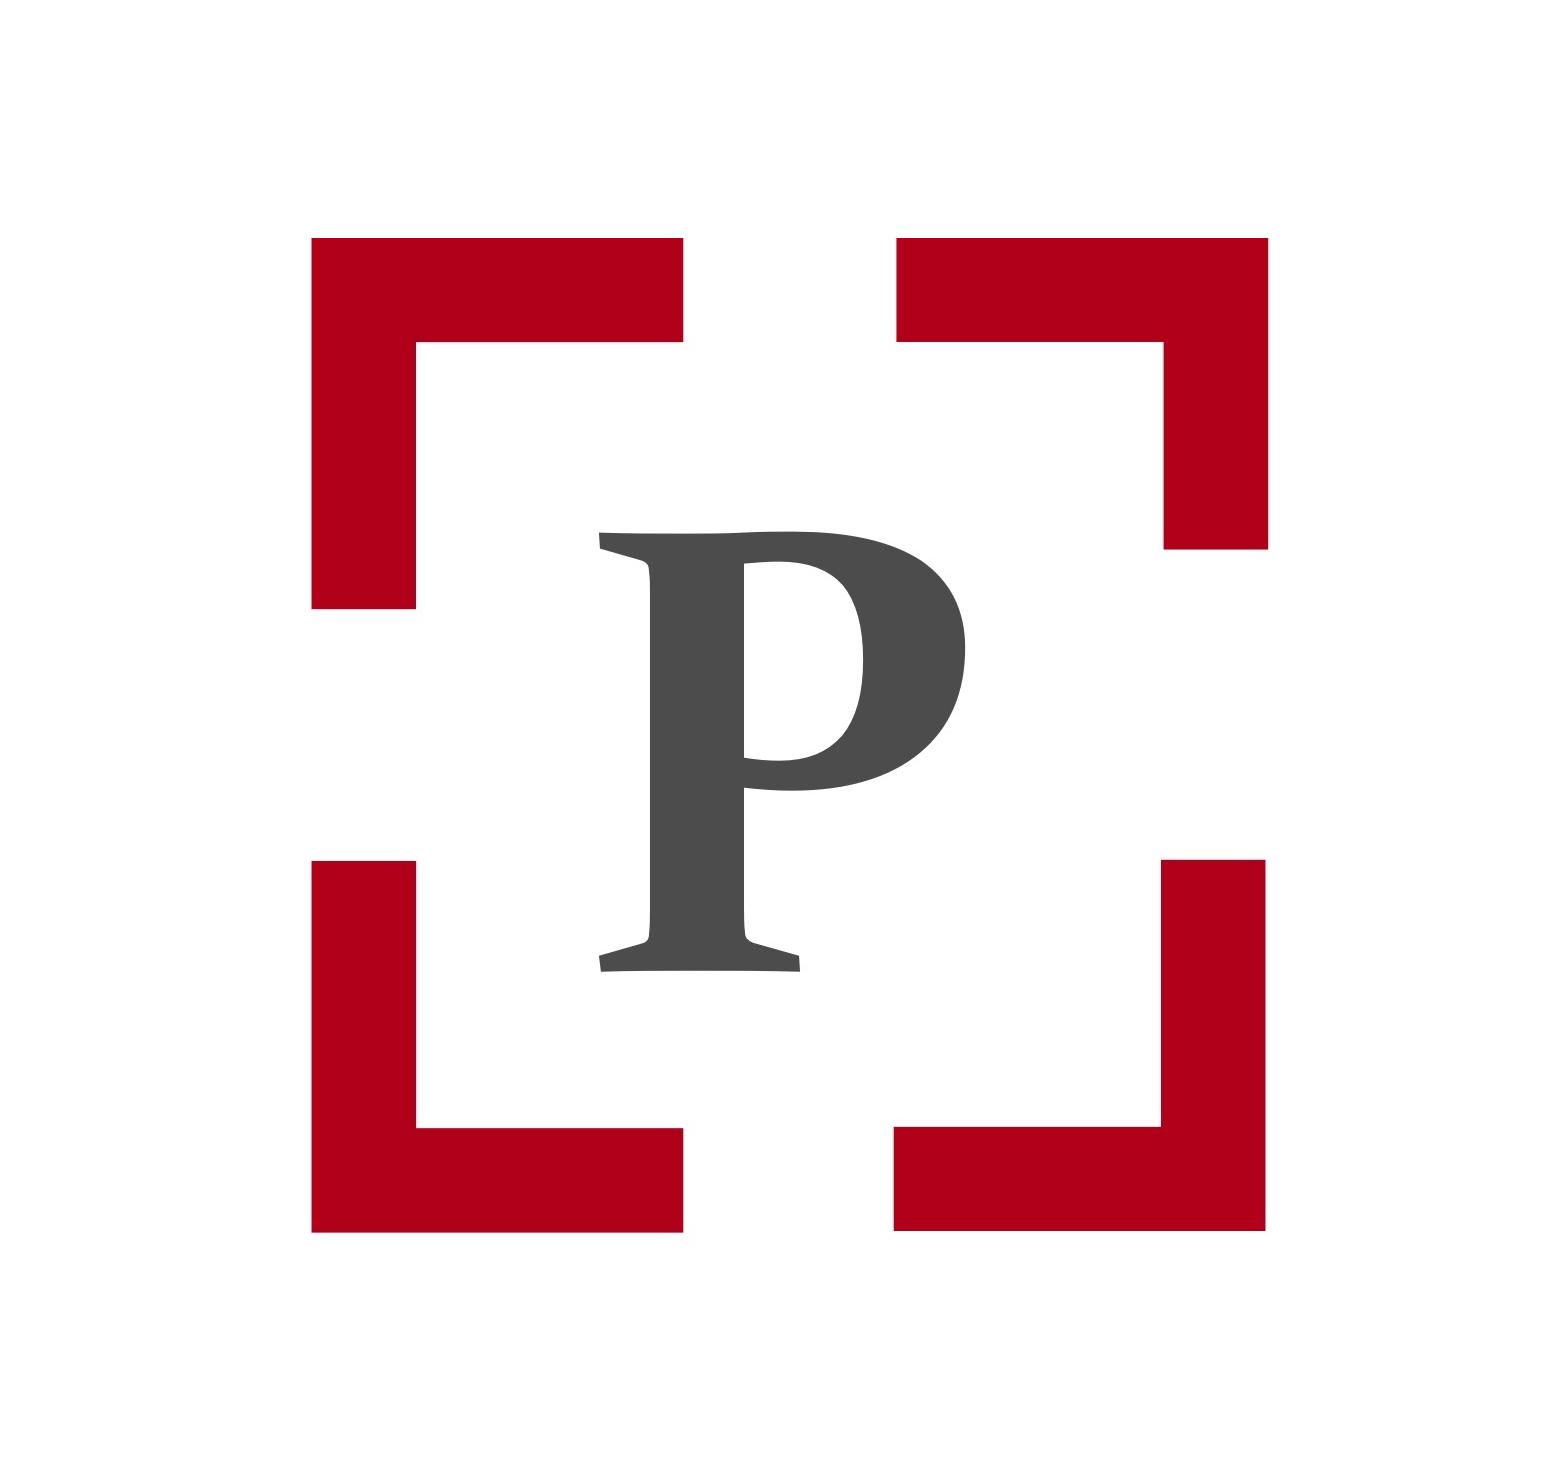 Promeda Hausverwaltung GmbH